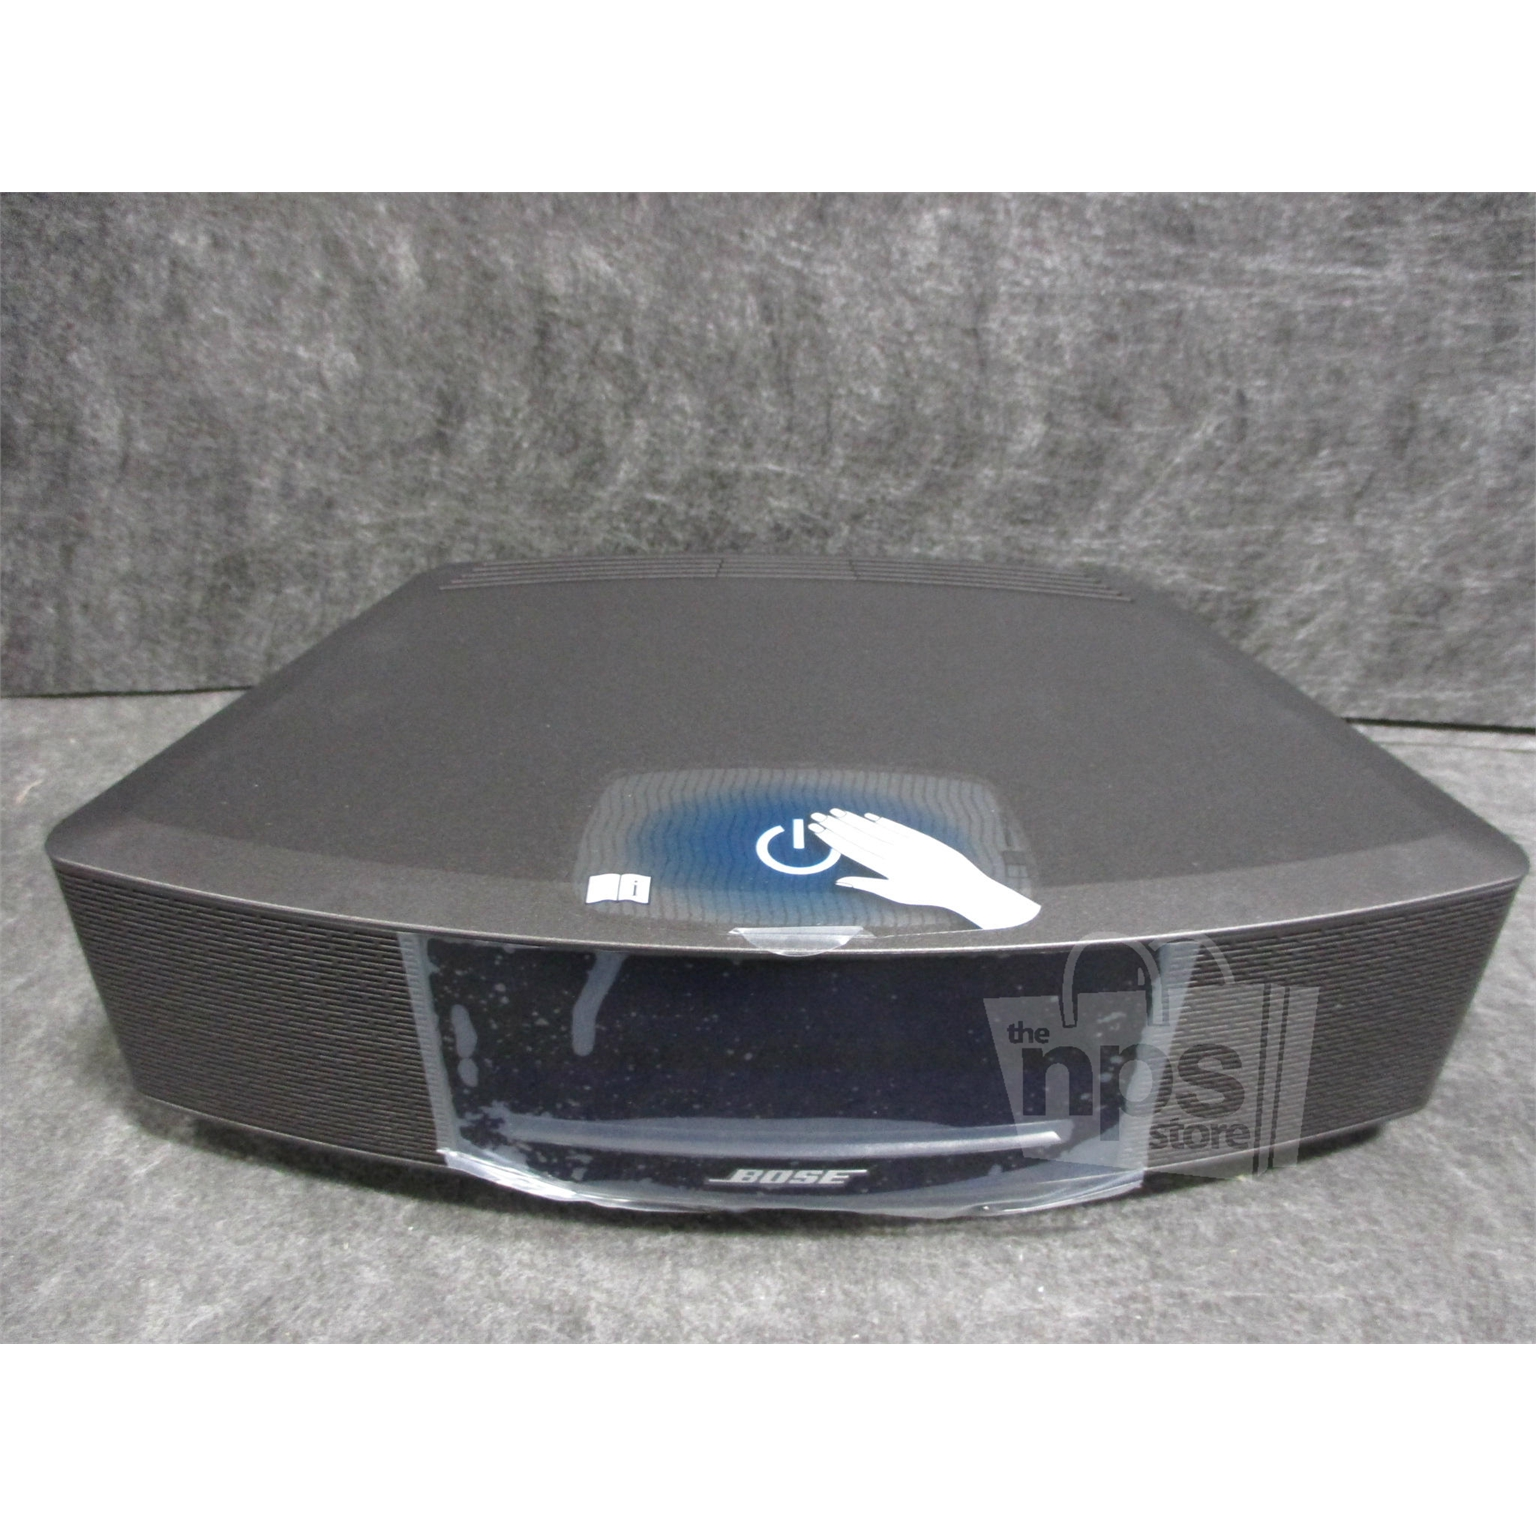 bose 738031 1710 wave soundtouch music system iv espresso. Black Bedroom Furniture Sets. Home Design Ideas